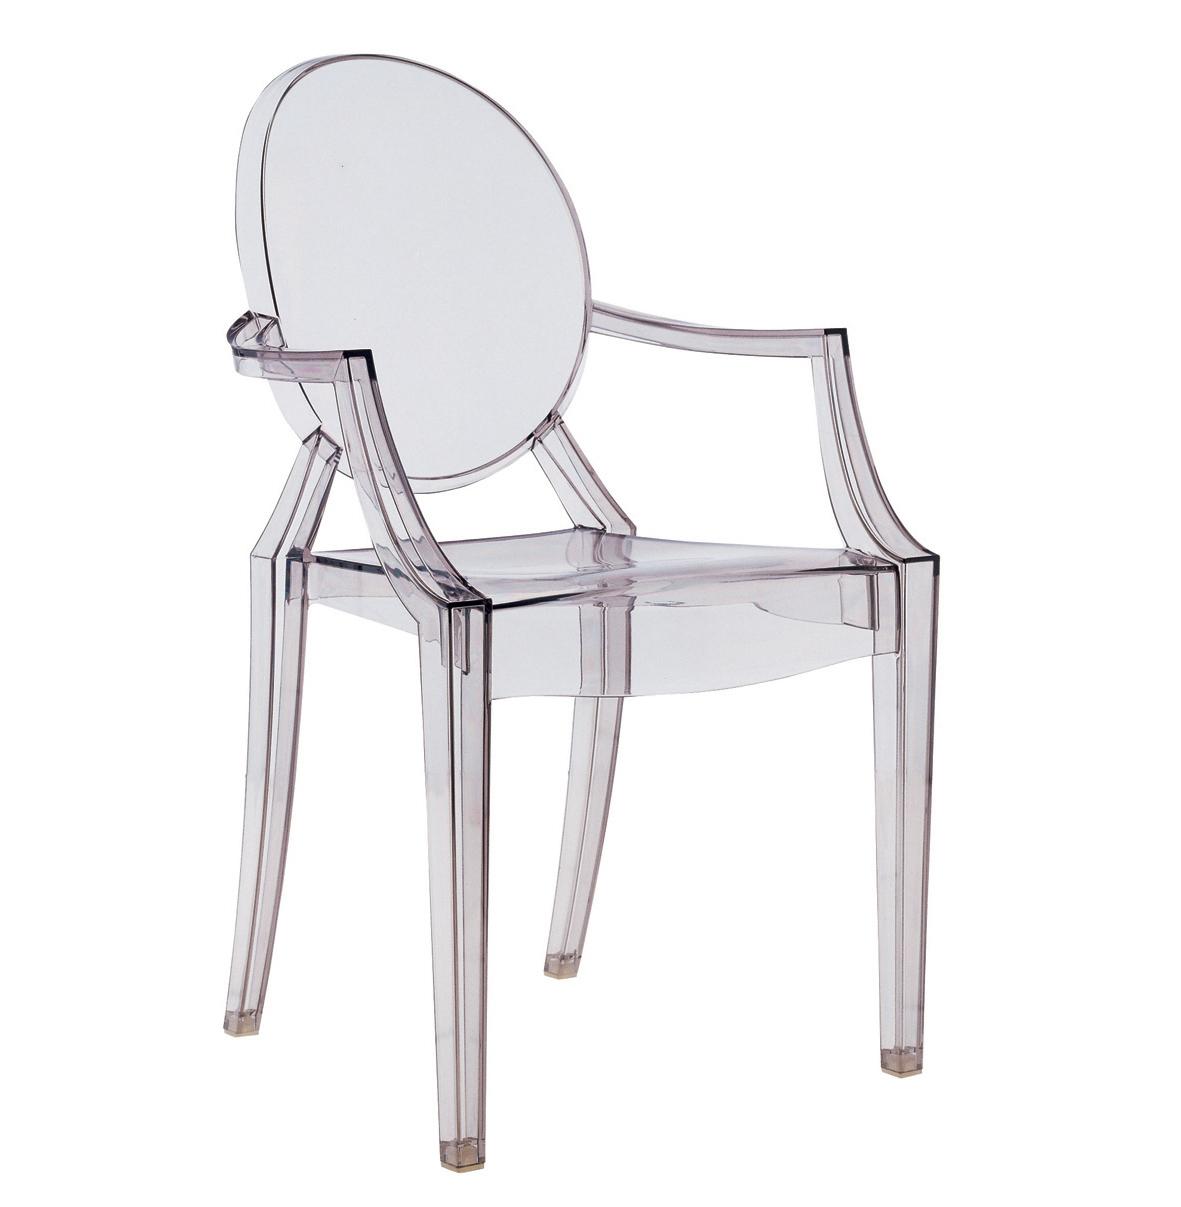 Kartell 6 Sedie Poltroncine Louis Ghost Trasparenti Design By Philippe Starck Ebay